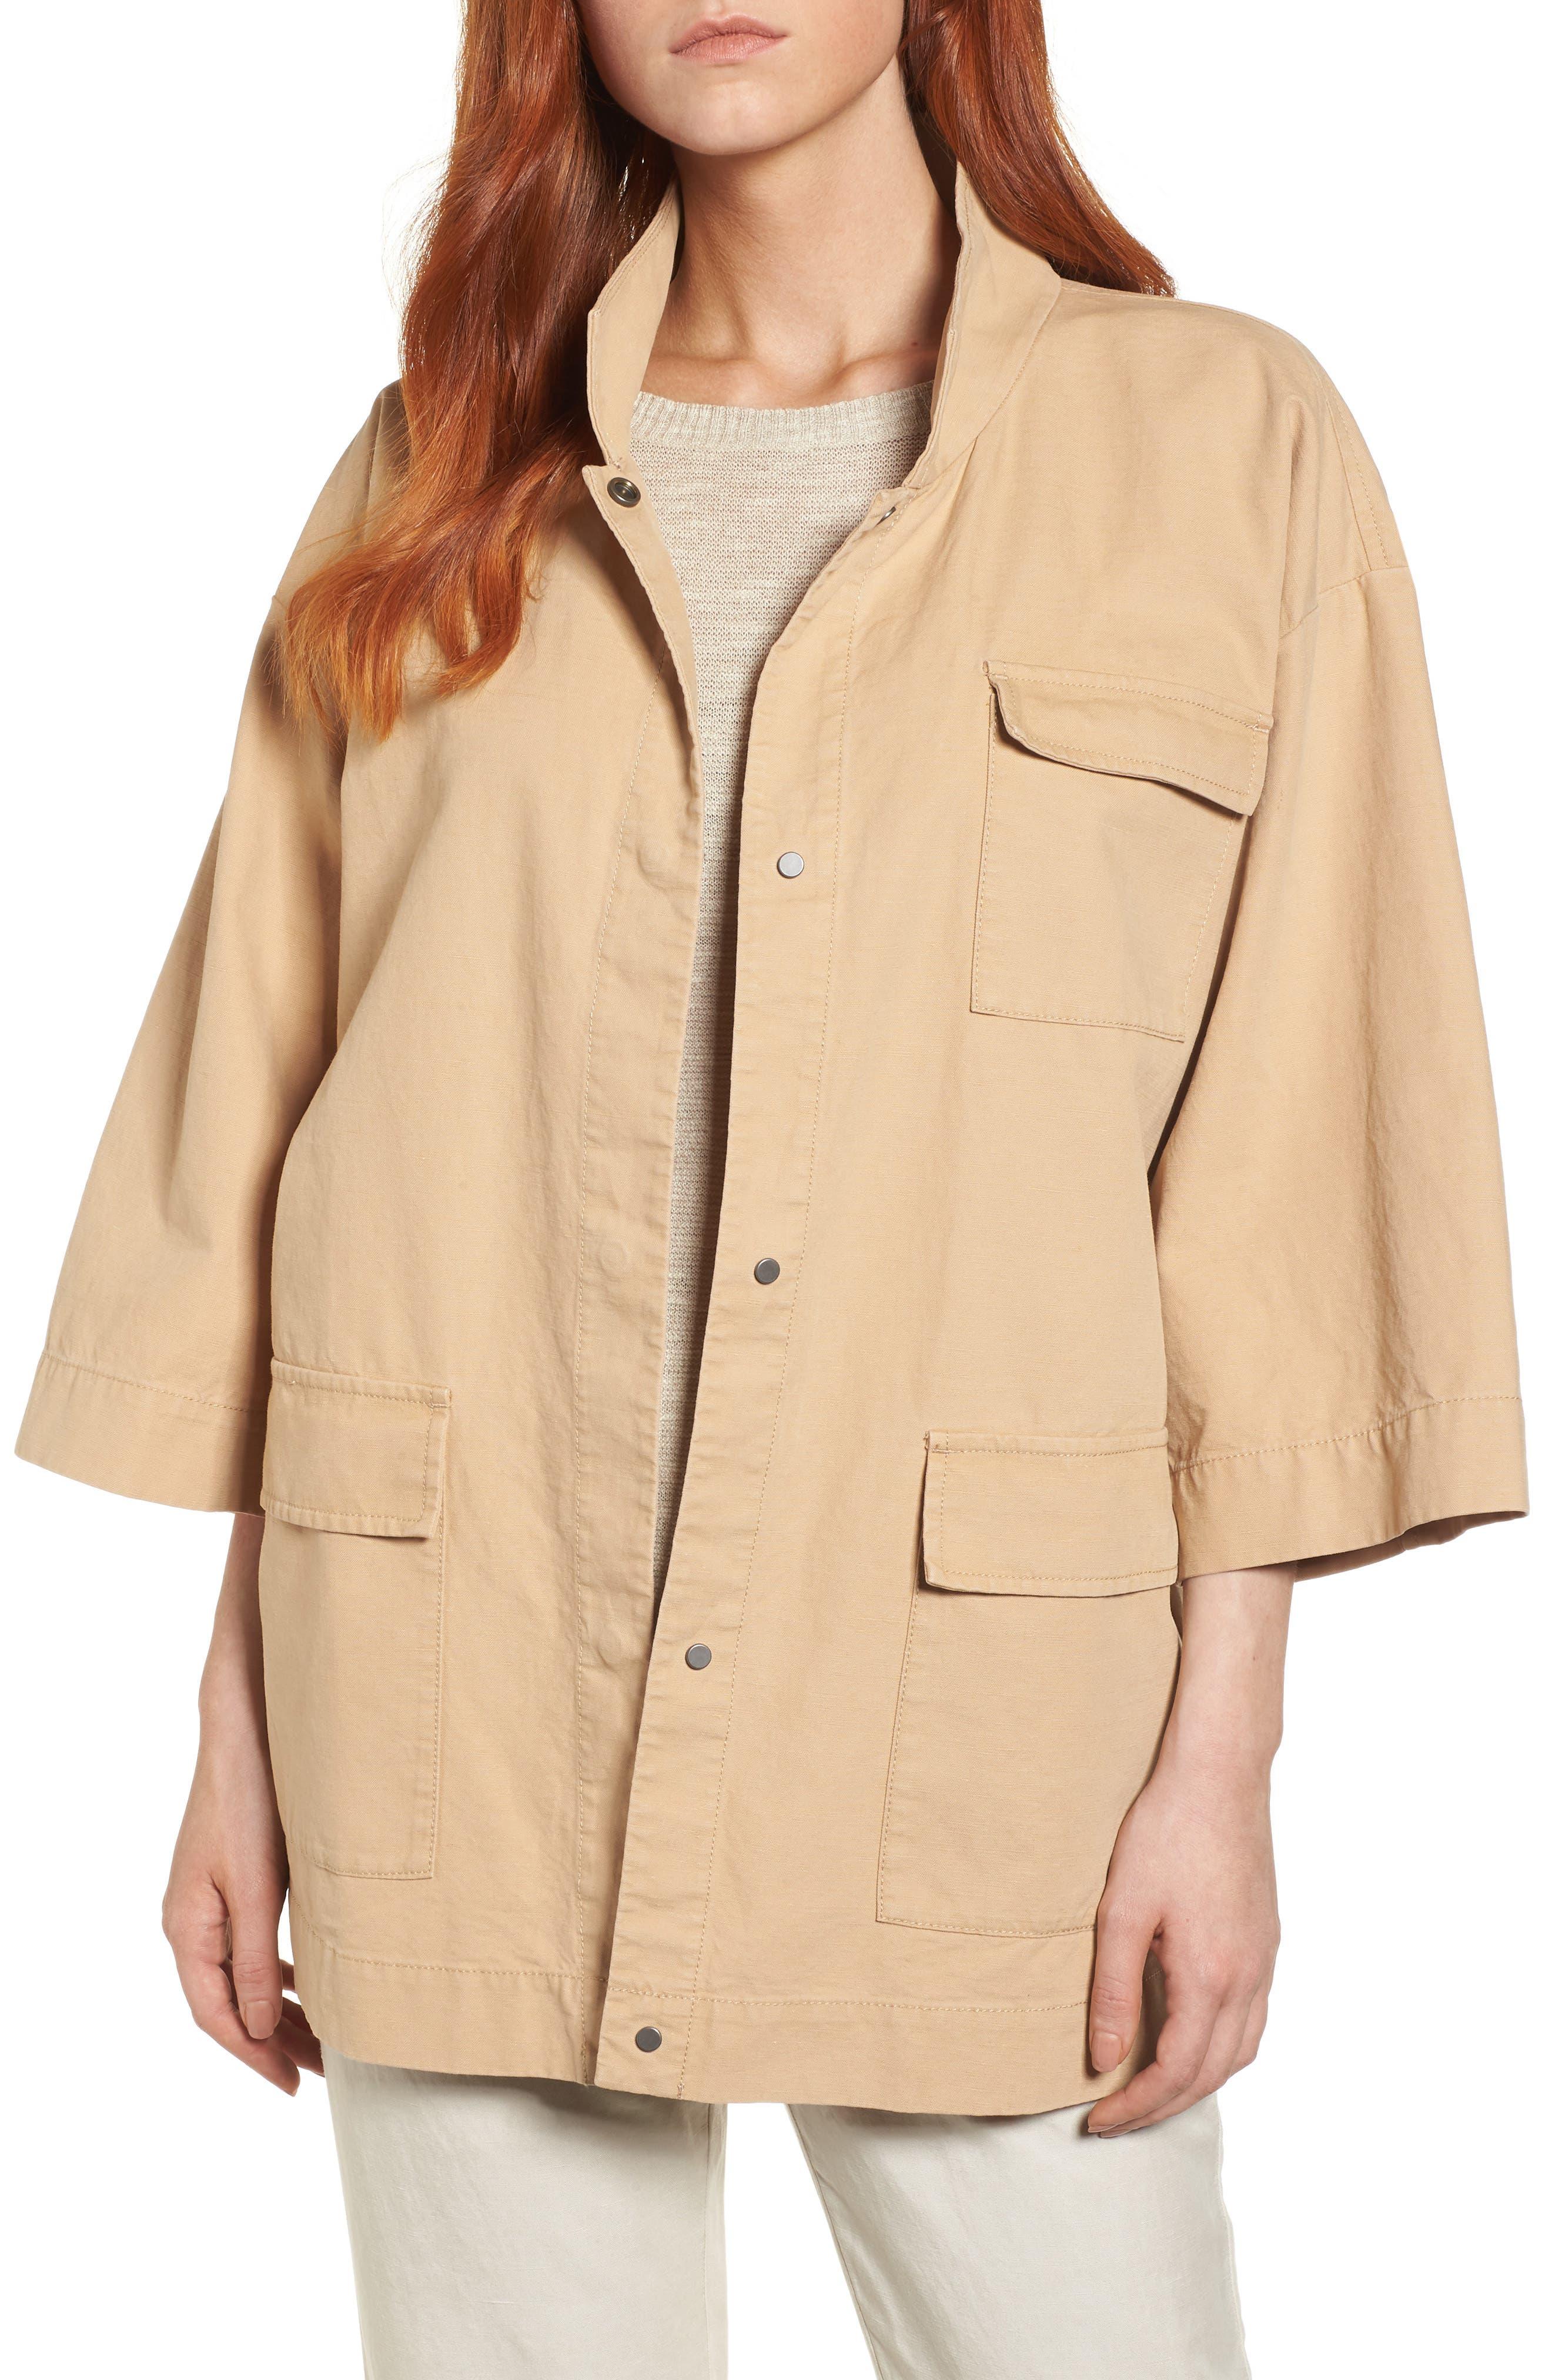 Main Image - Eileen Fisher Organic Cotton & Hemp Jacket (Regular & Petite)